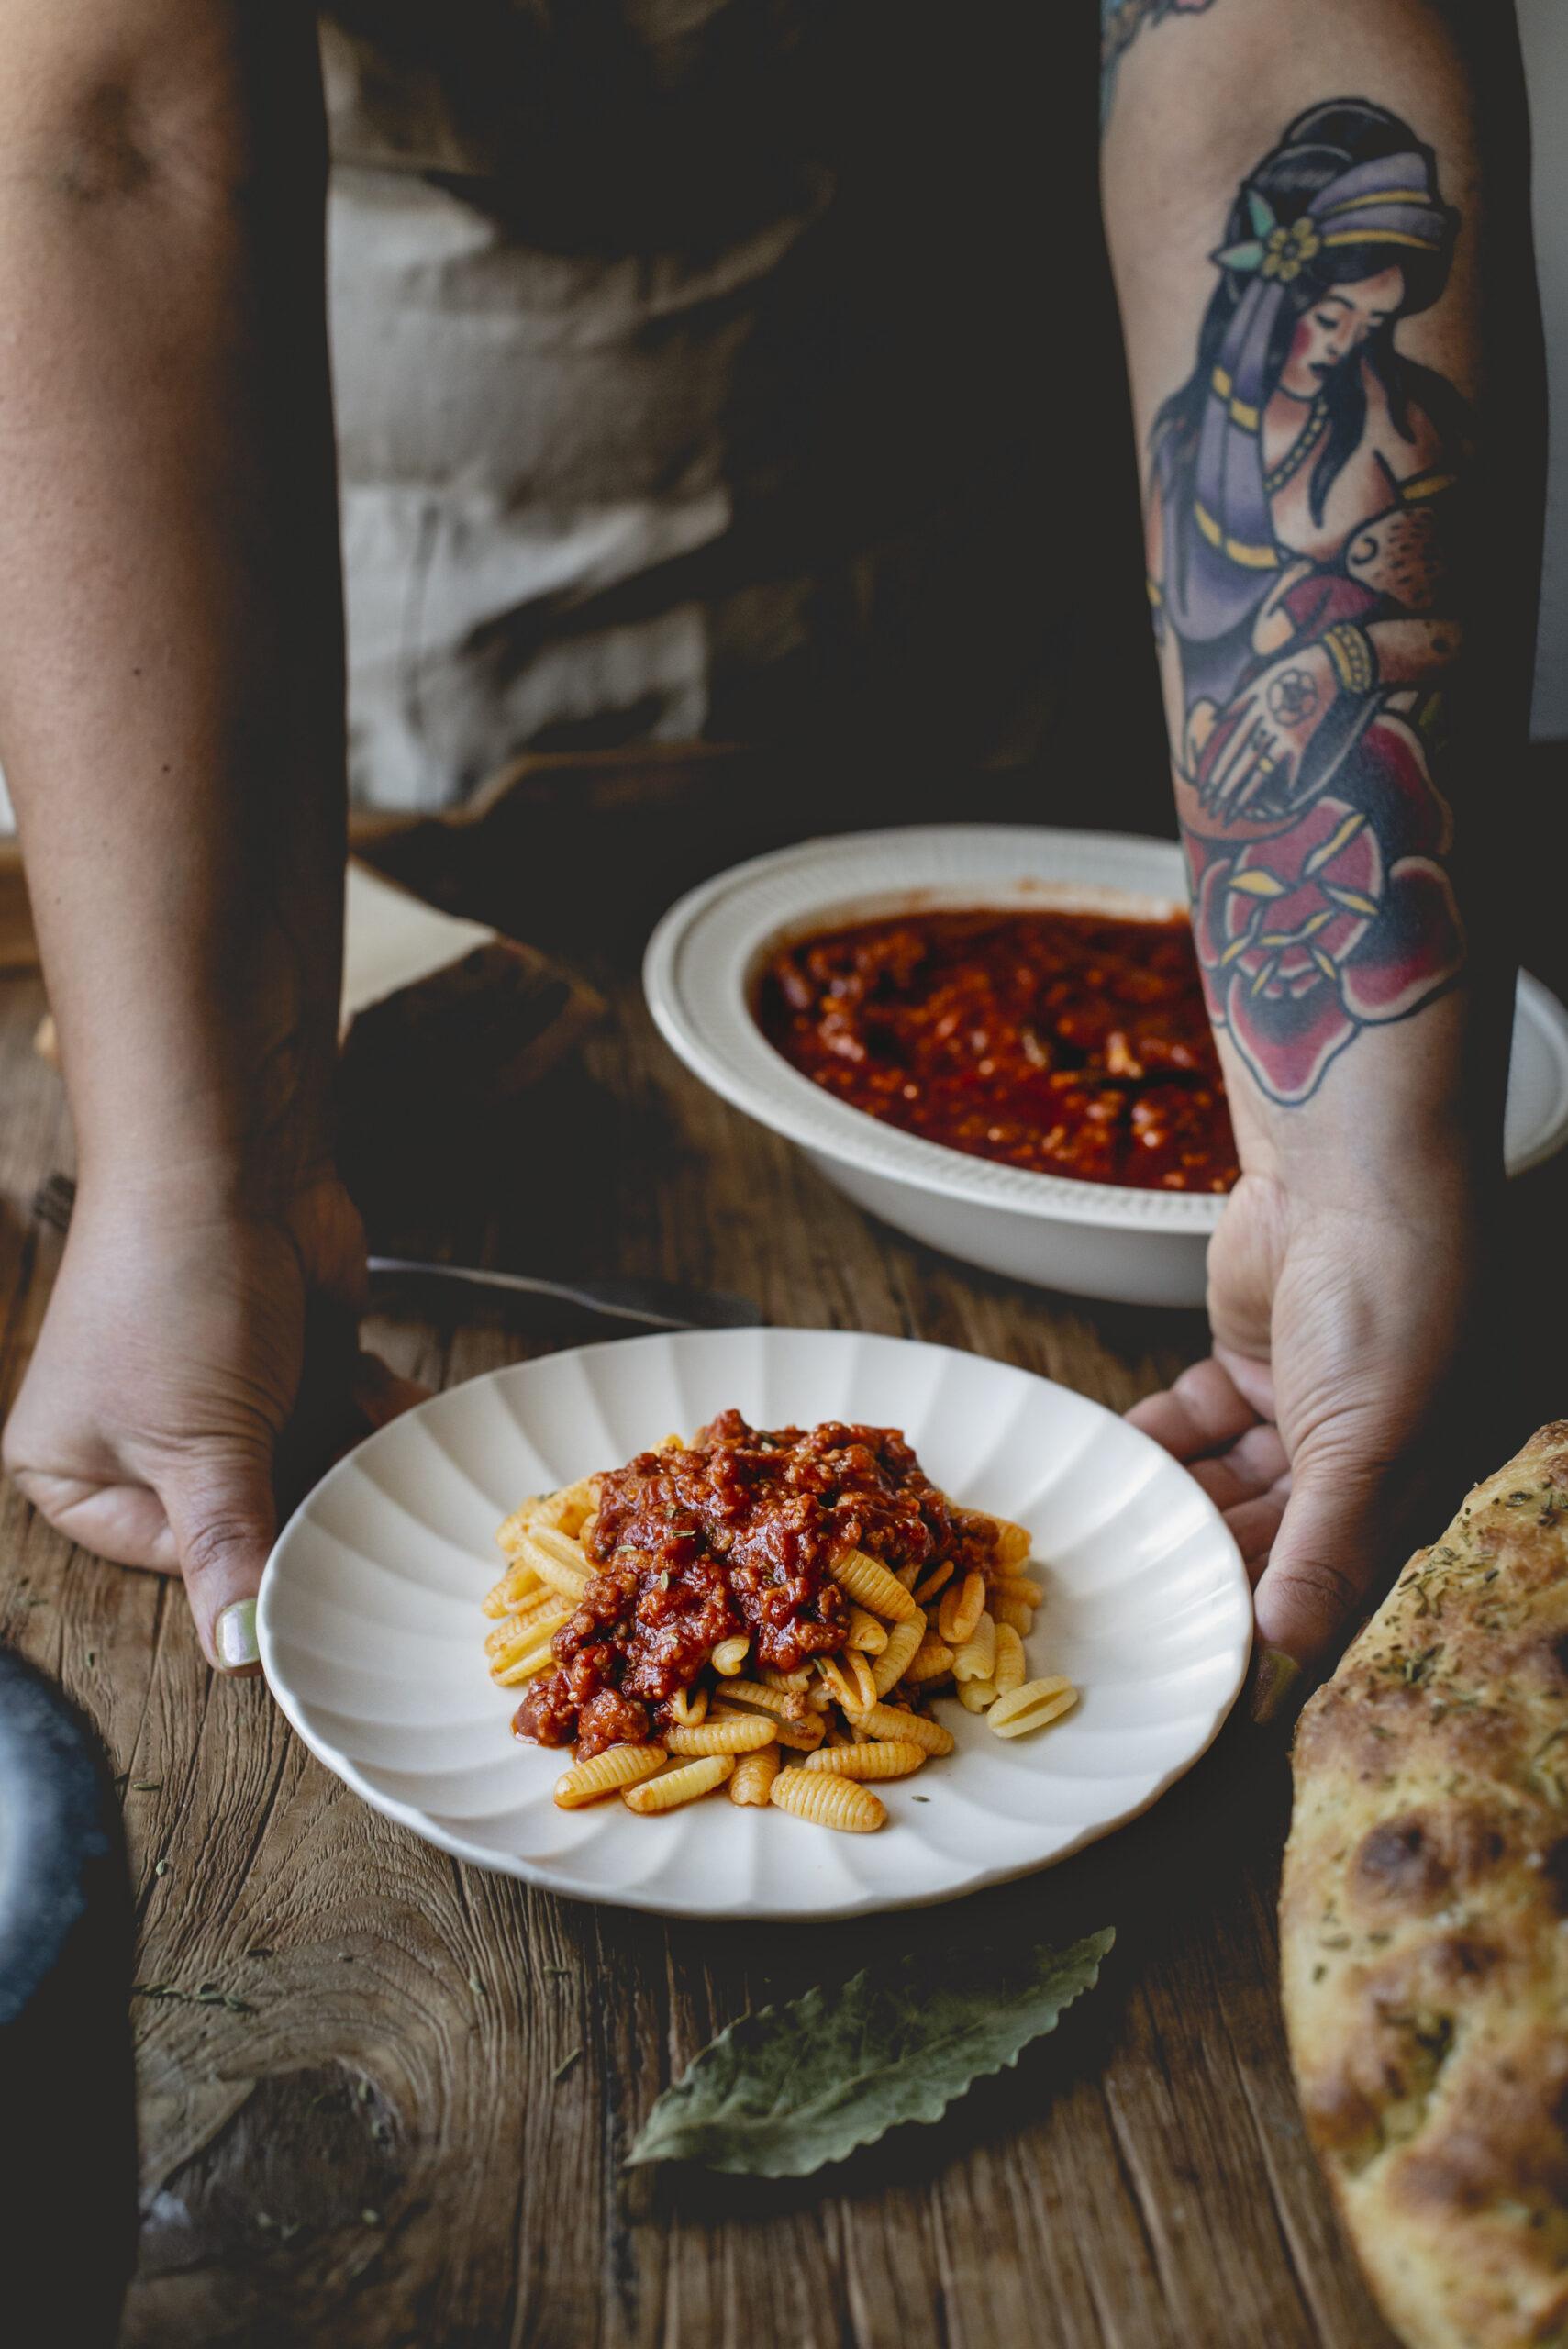 Ragu Puur Deliz Handboek kookboek foodfotograaf Stefanie Spoelder Silvia Tatti